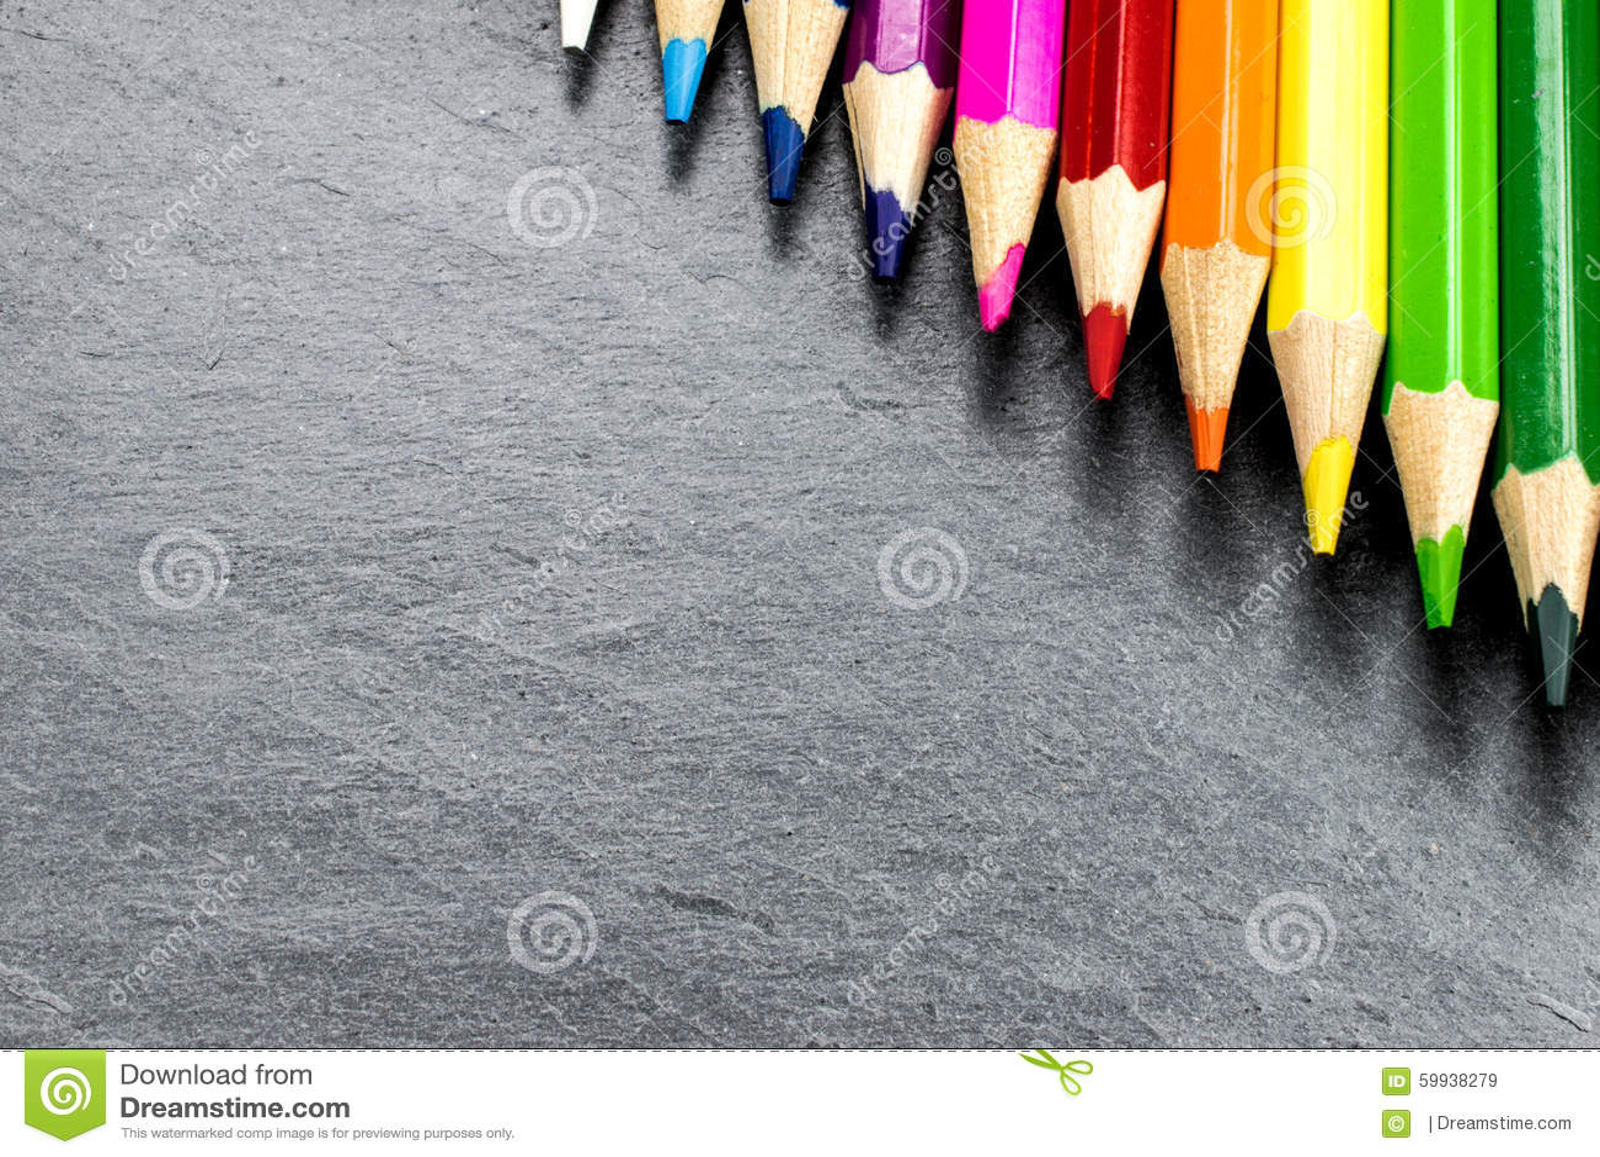 Lápices coloreados en pizarra